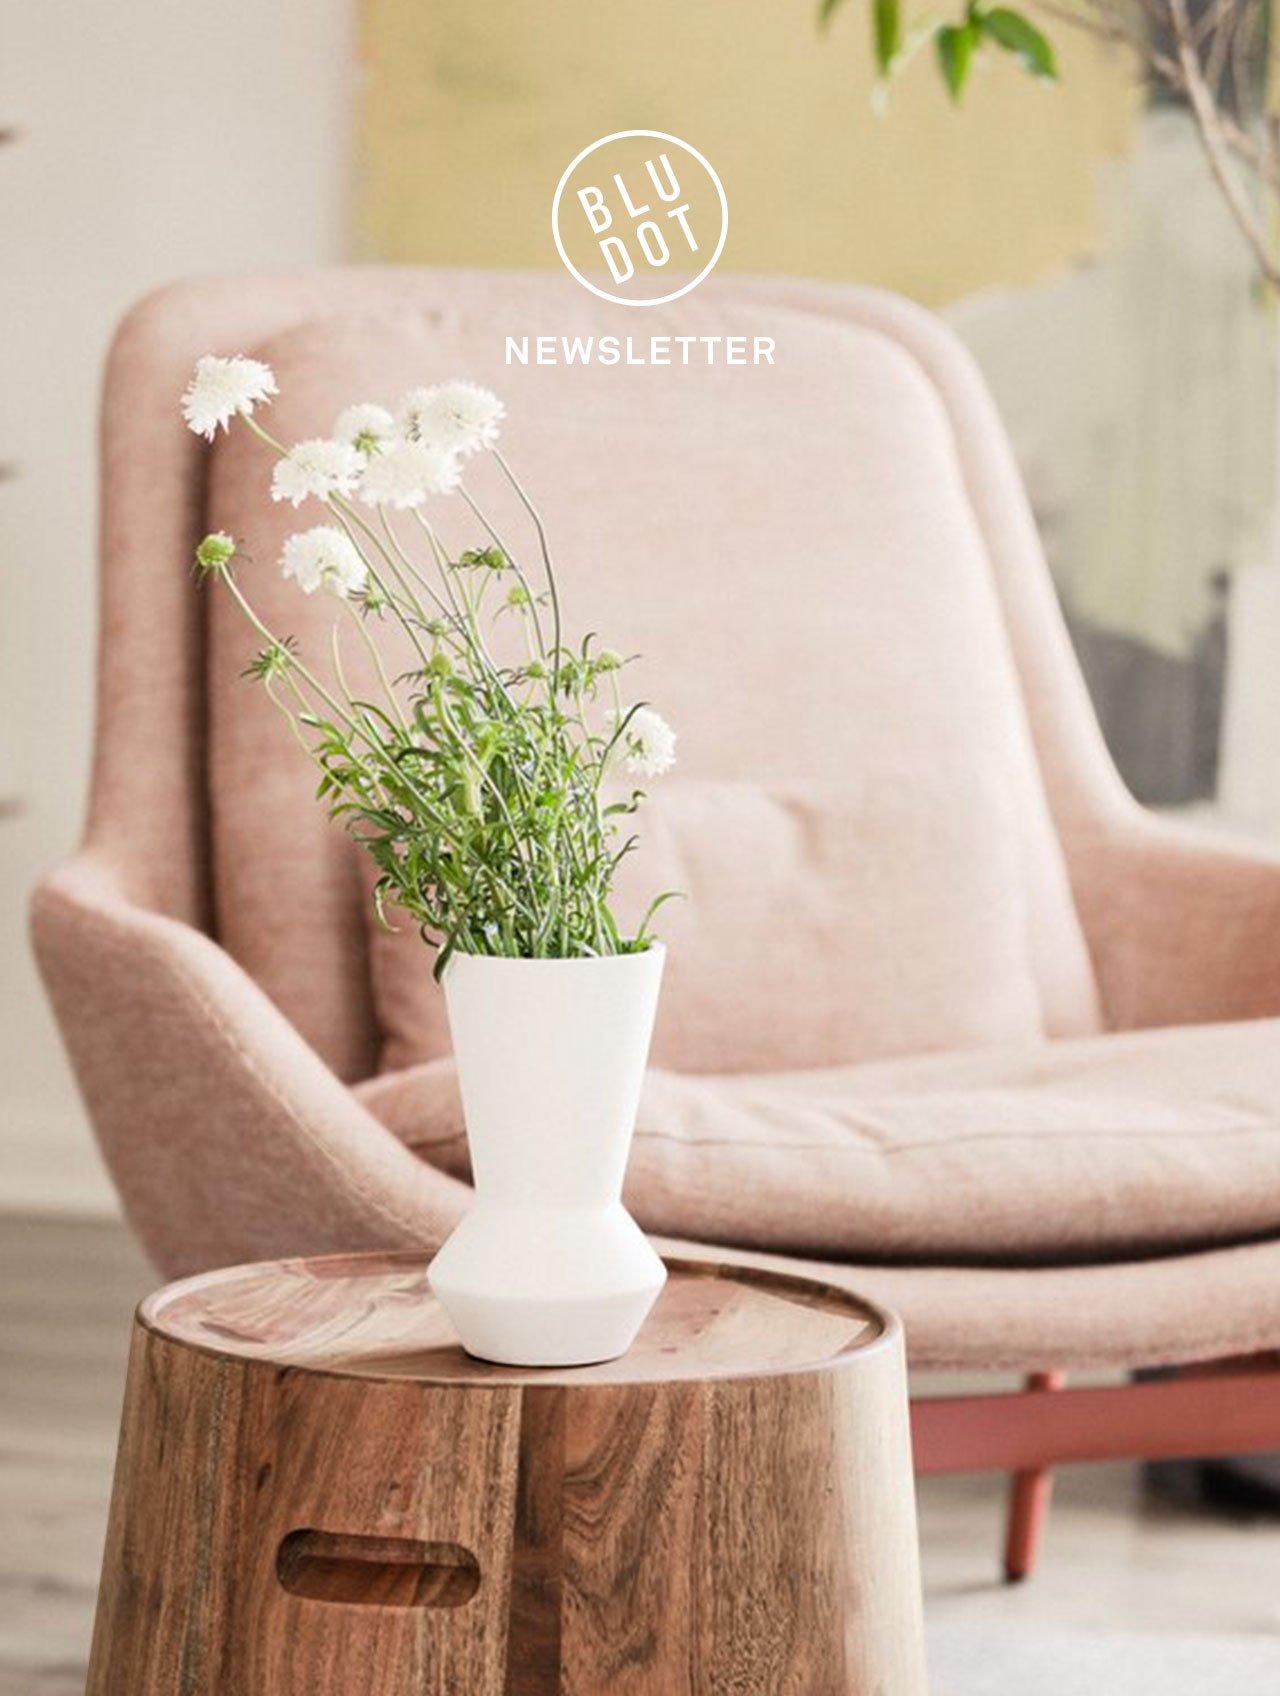 Awe Inspiring Bludot Blu Dots February Newsletter Milled Ibusinesslaw Wood Chair Design Ideas Ibusinesslaworg